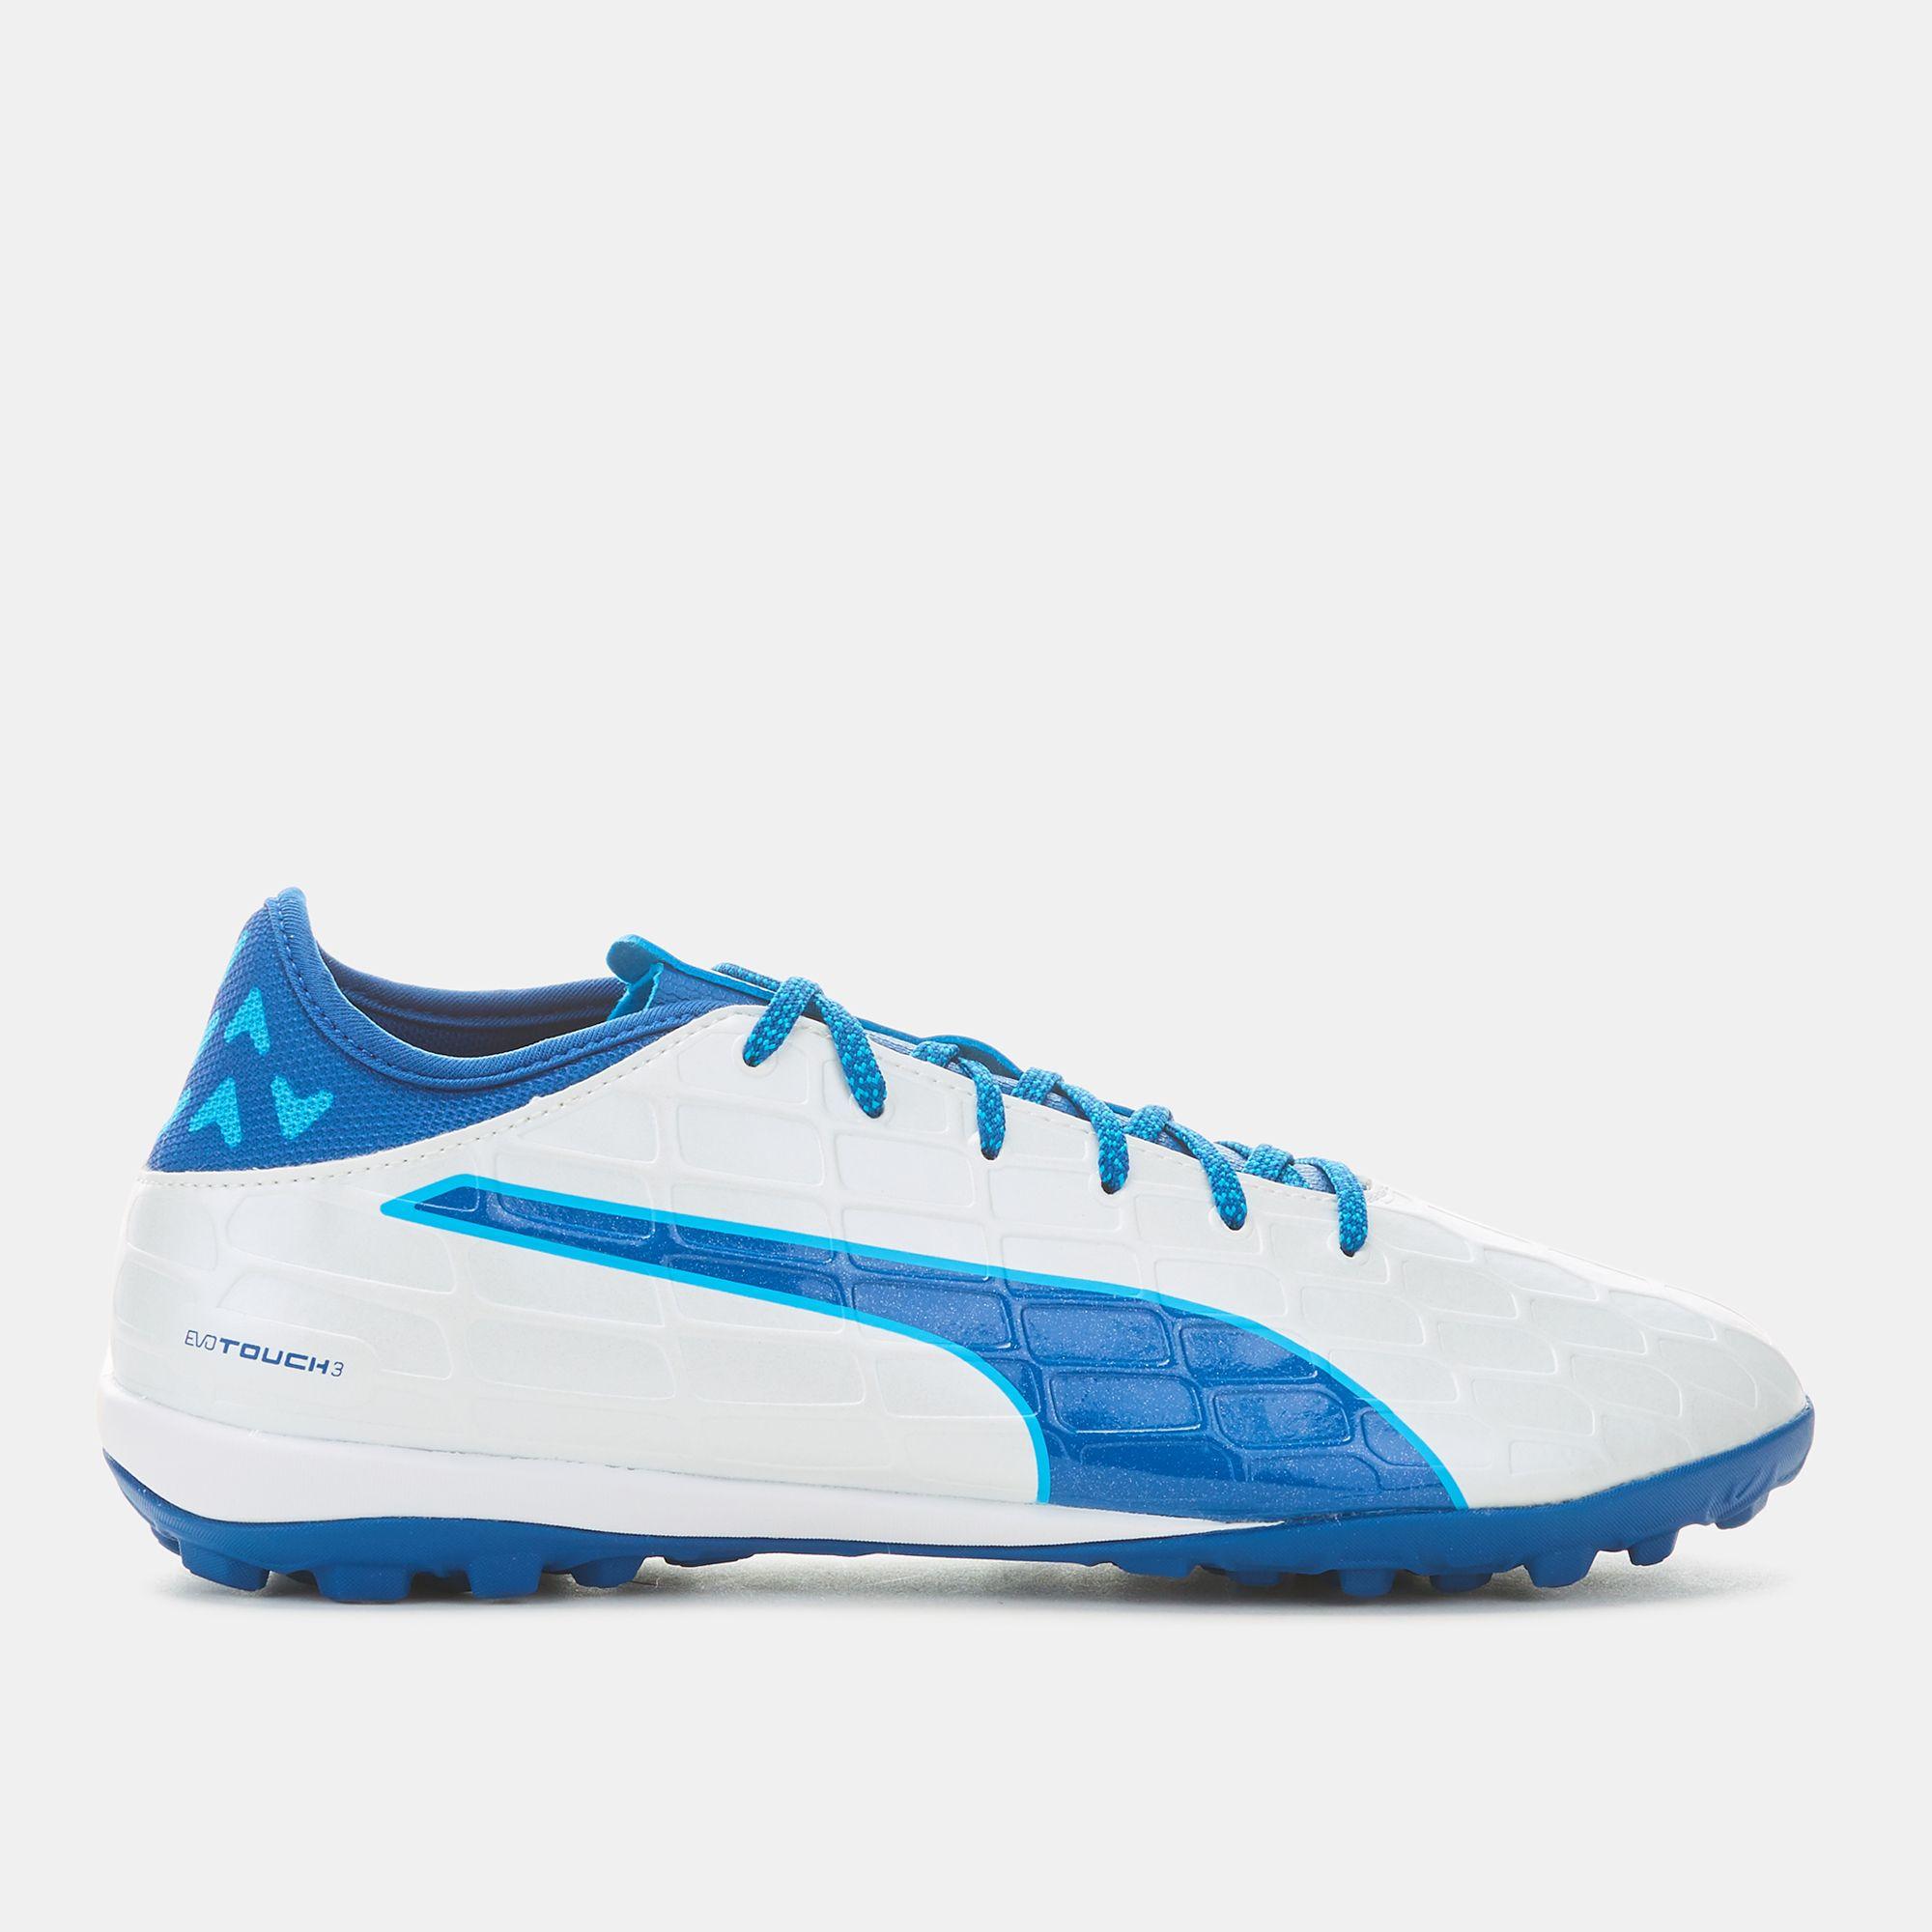 PUMA evoTOUCH 3 Turf Training Shoe  f33857047